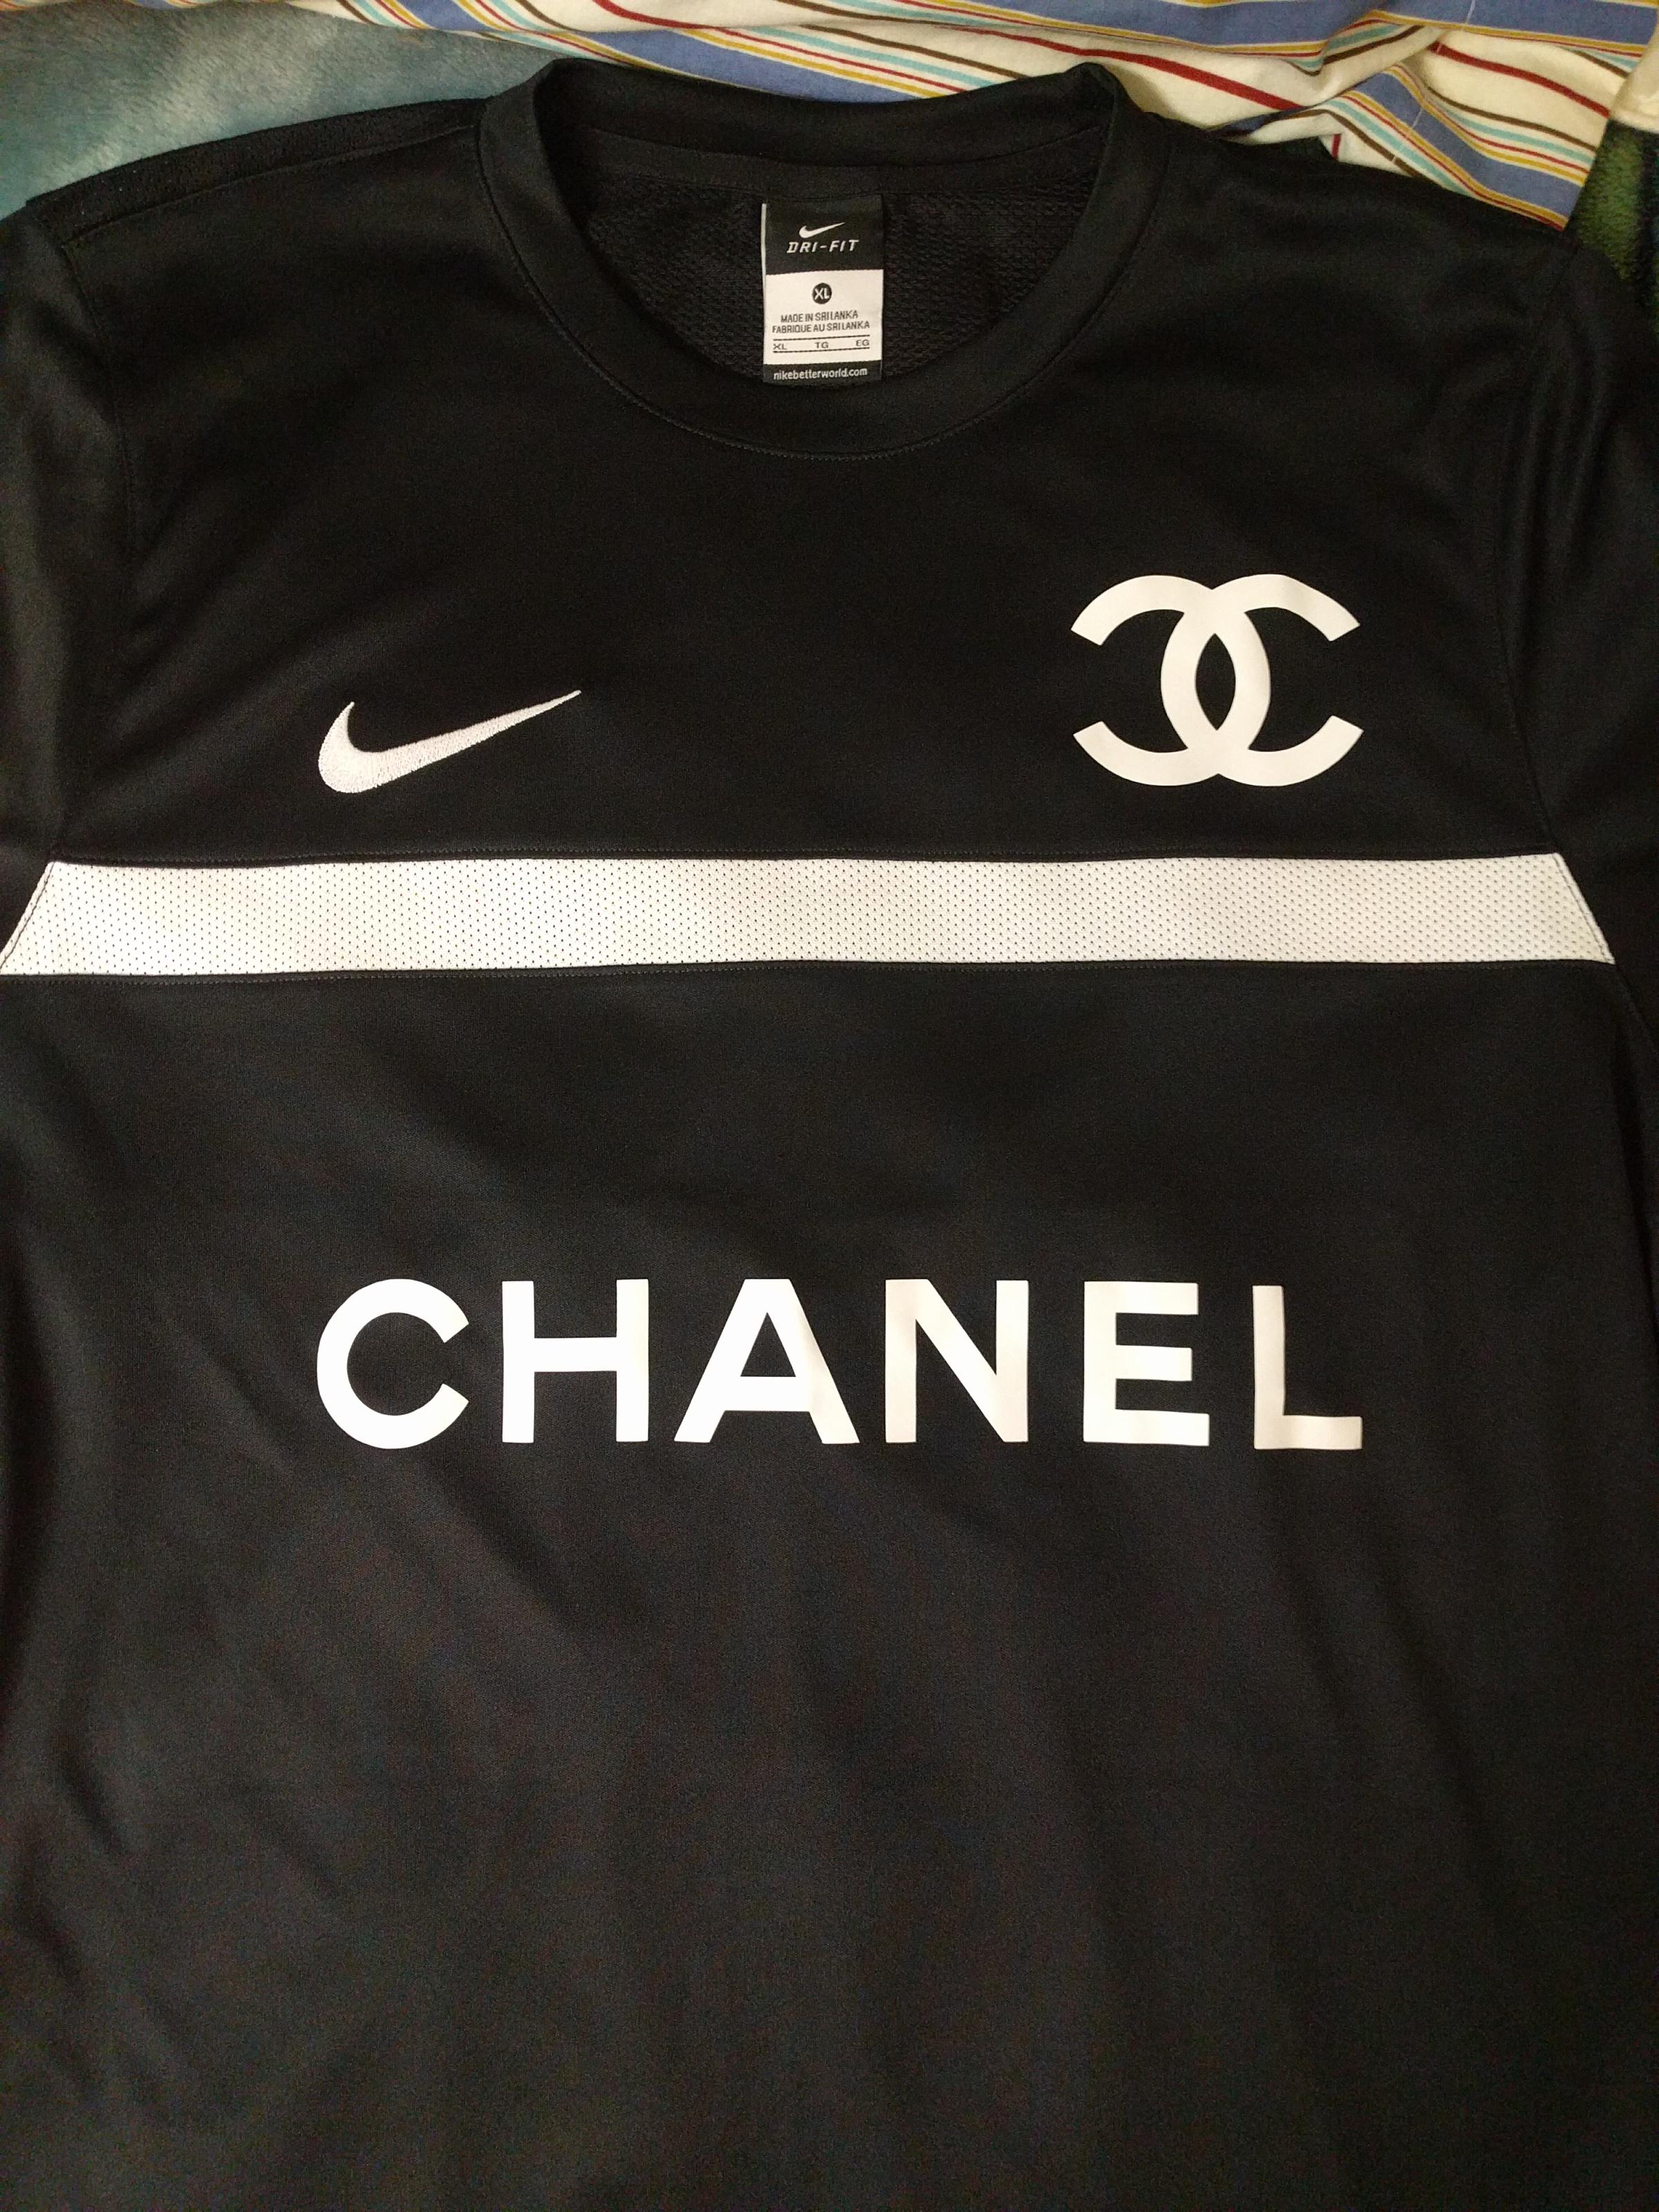 c95d2e87133 Chanel Soccer Jersey Nike - Nils Stucki Kieferorthopäde